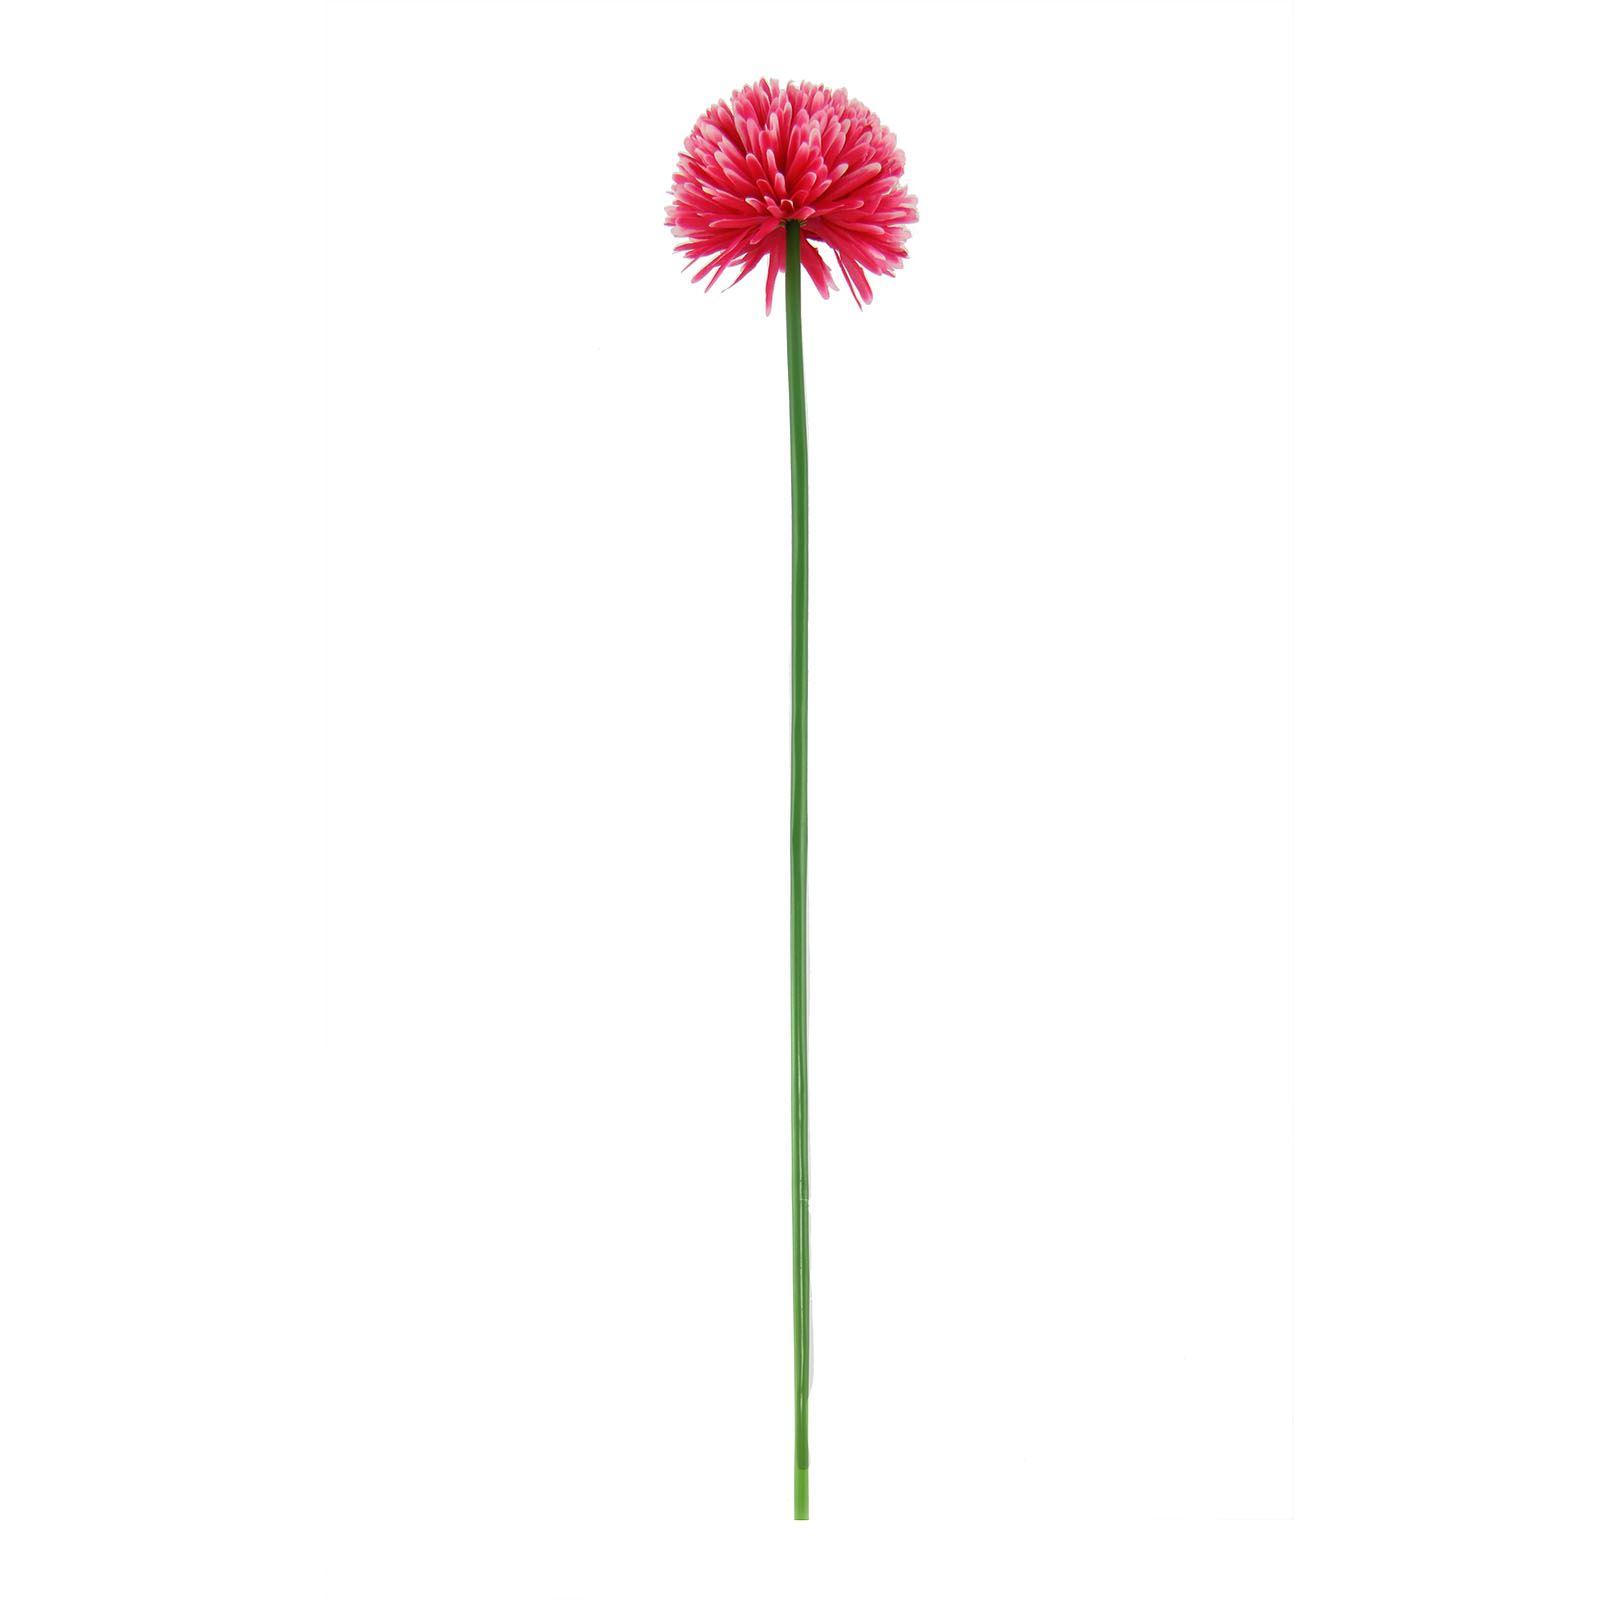 Single Xl Pompom Mum Flower Artificial Silk Flowers Long Stemmed